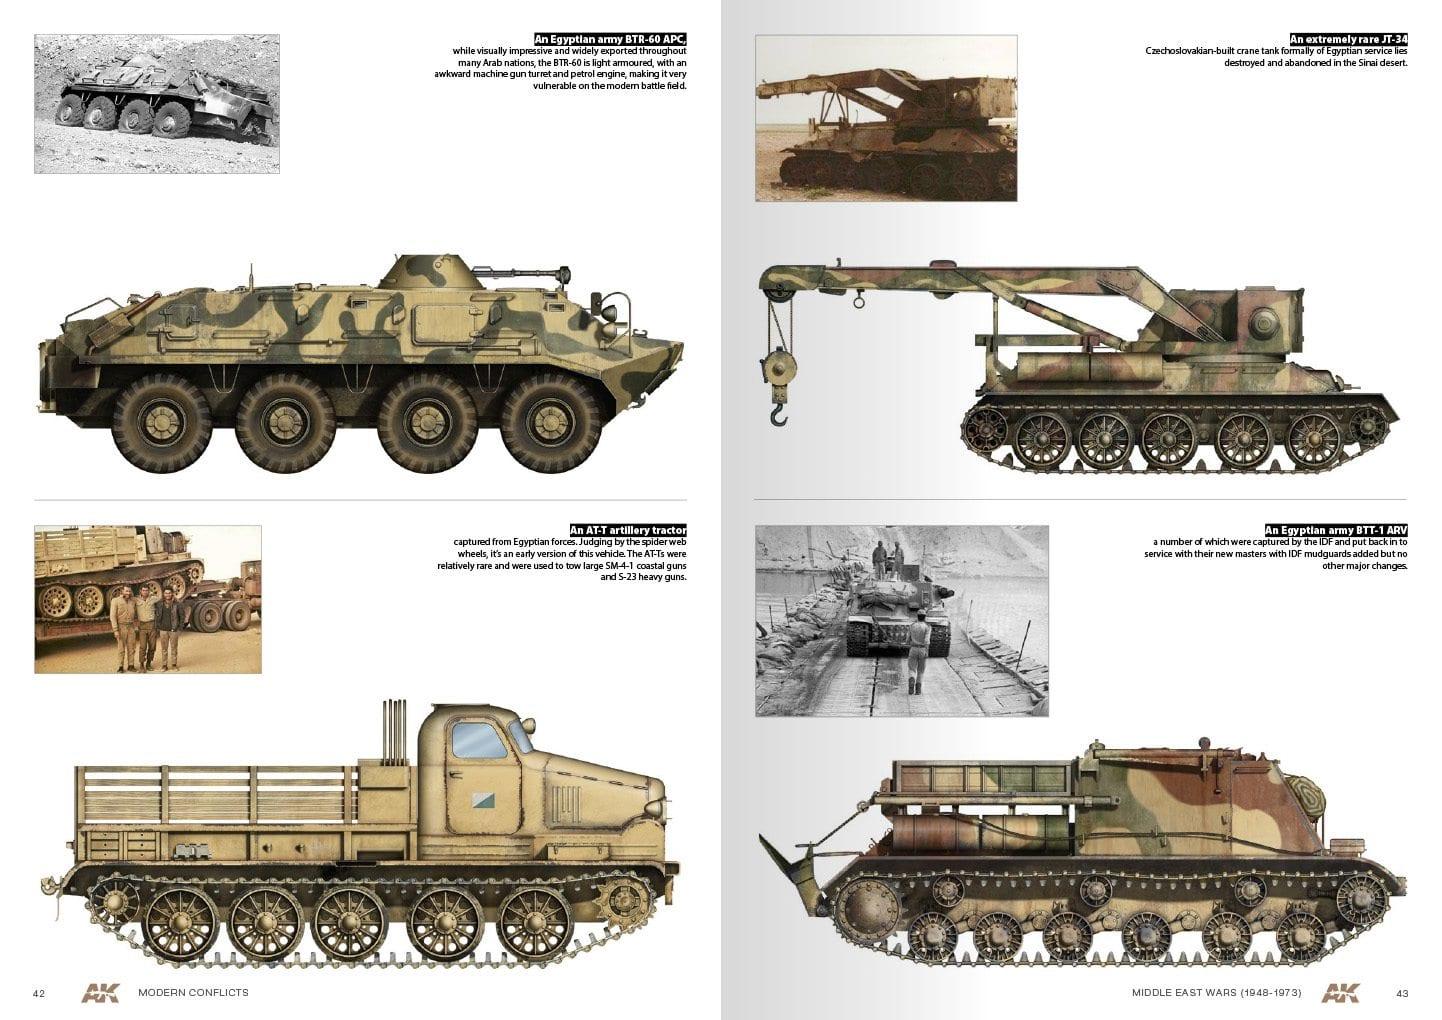 Buy MIDDLE EAST WARS 1948-1973 VOL.1 Profile guide online ...